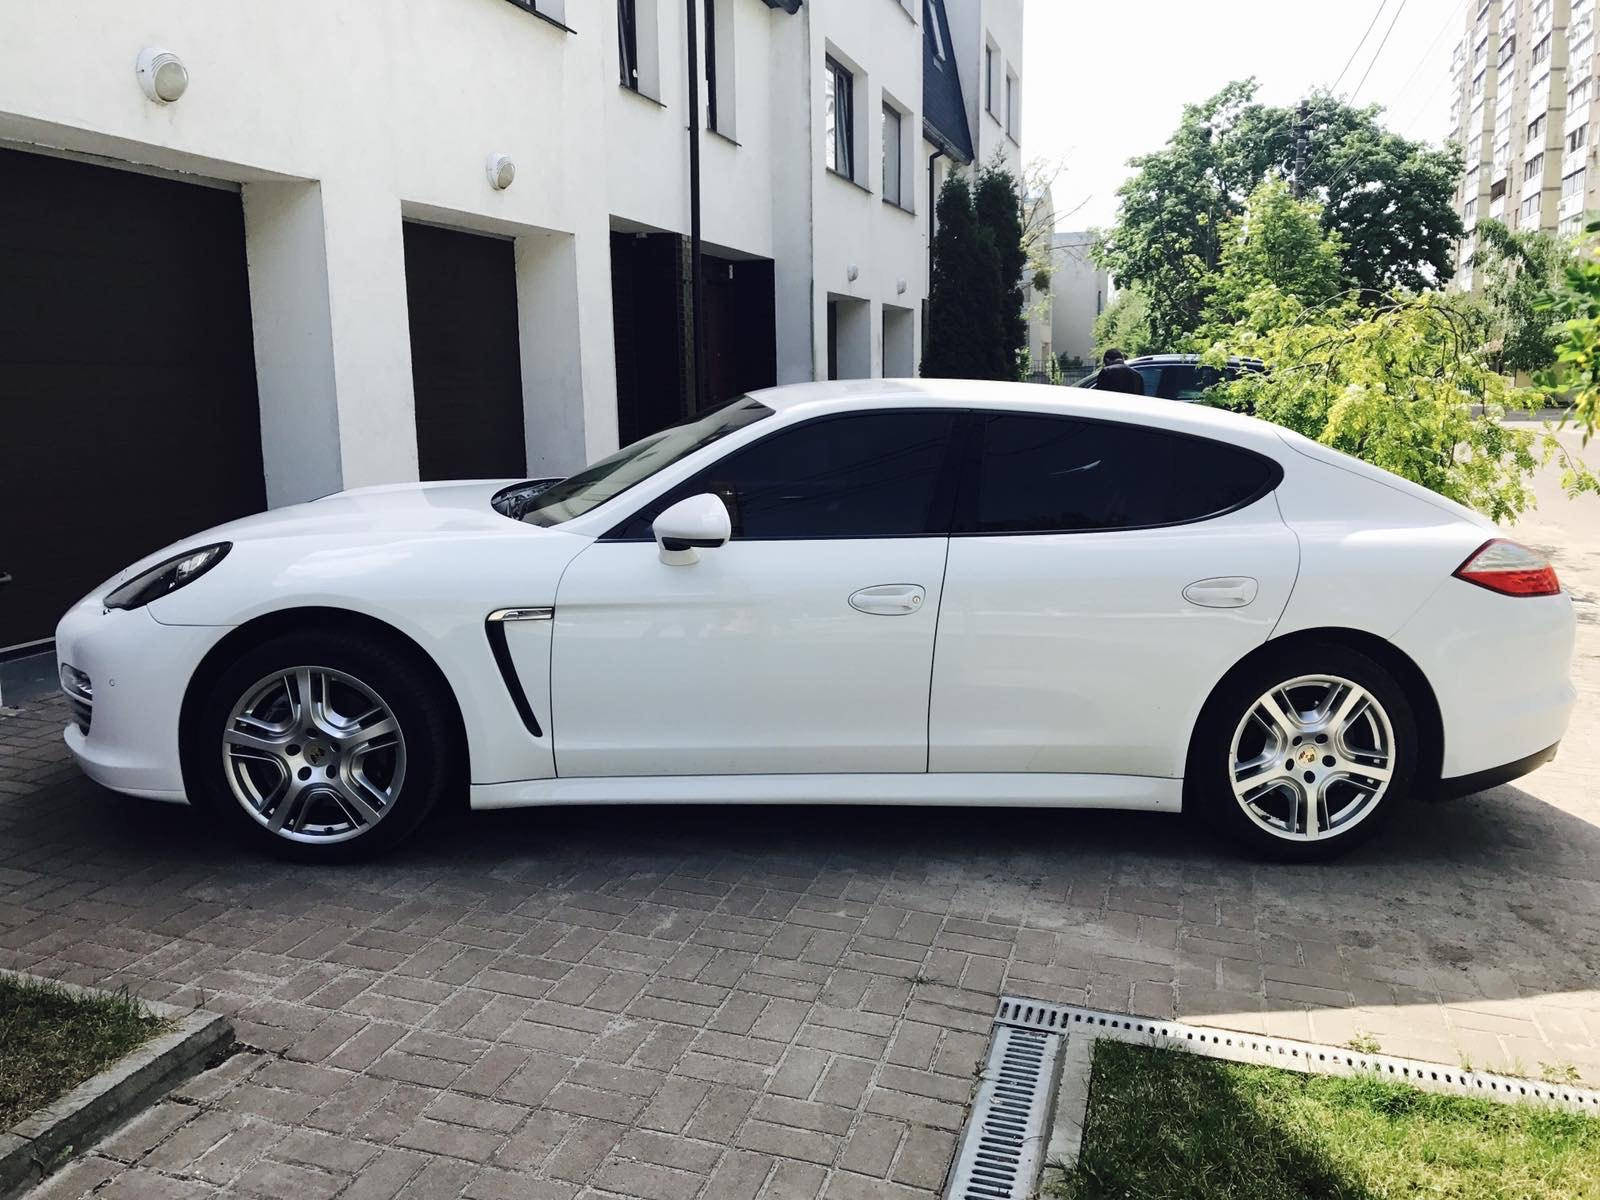 cabriolet, sports car rental in Kiev Porsche Panamera (3)